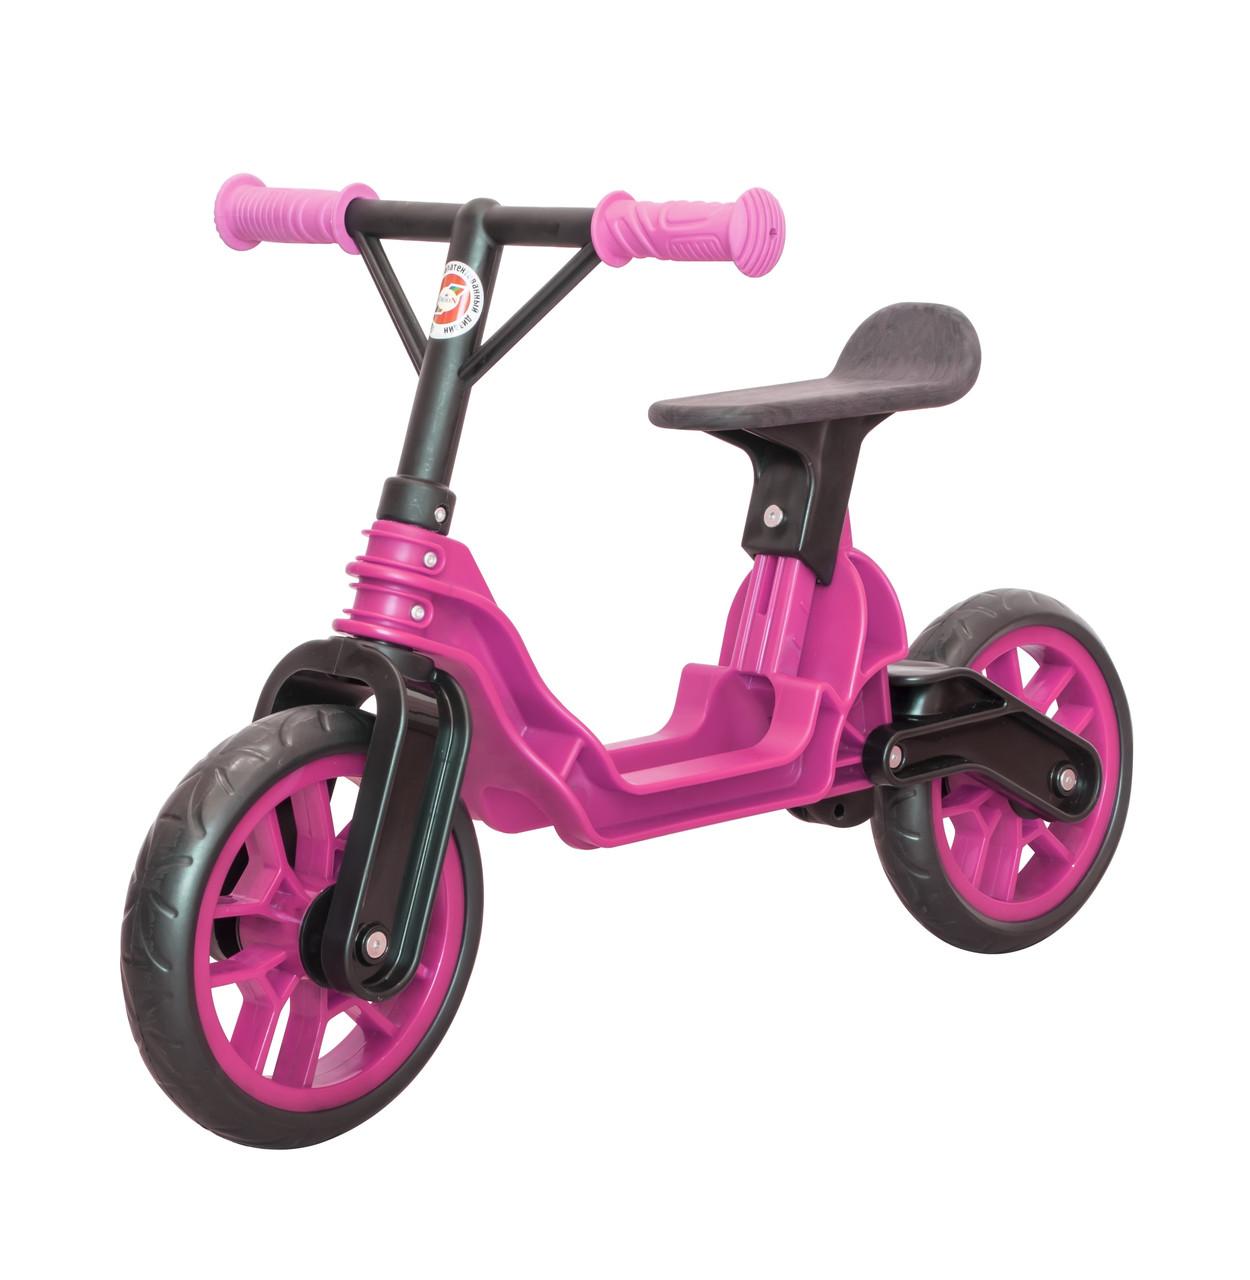 Мотоцикл 2-х колёсный Байк беговел ярко-розовый